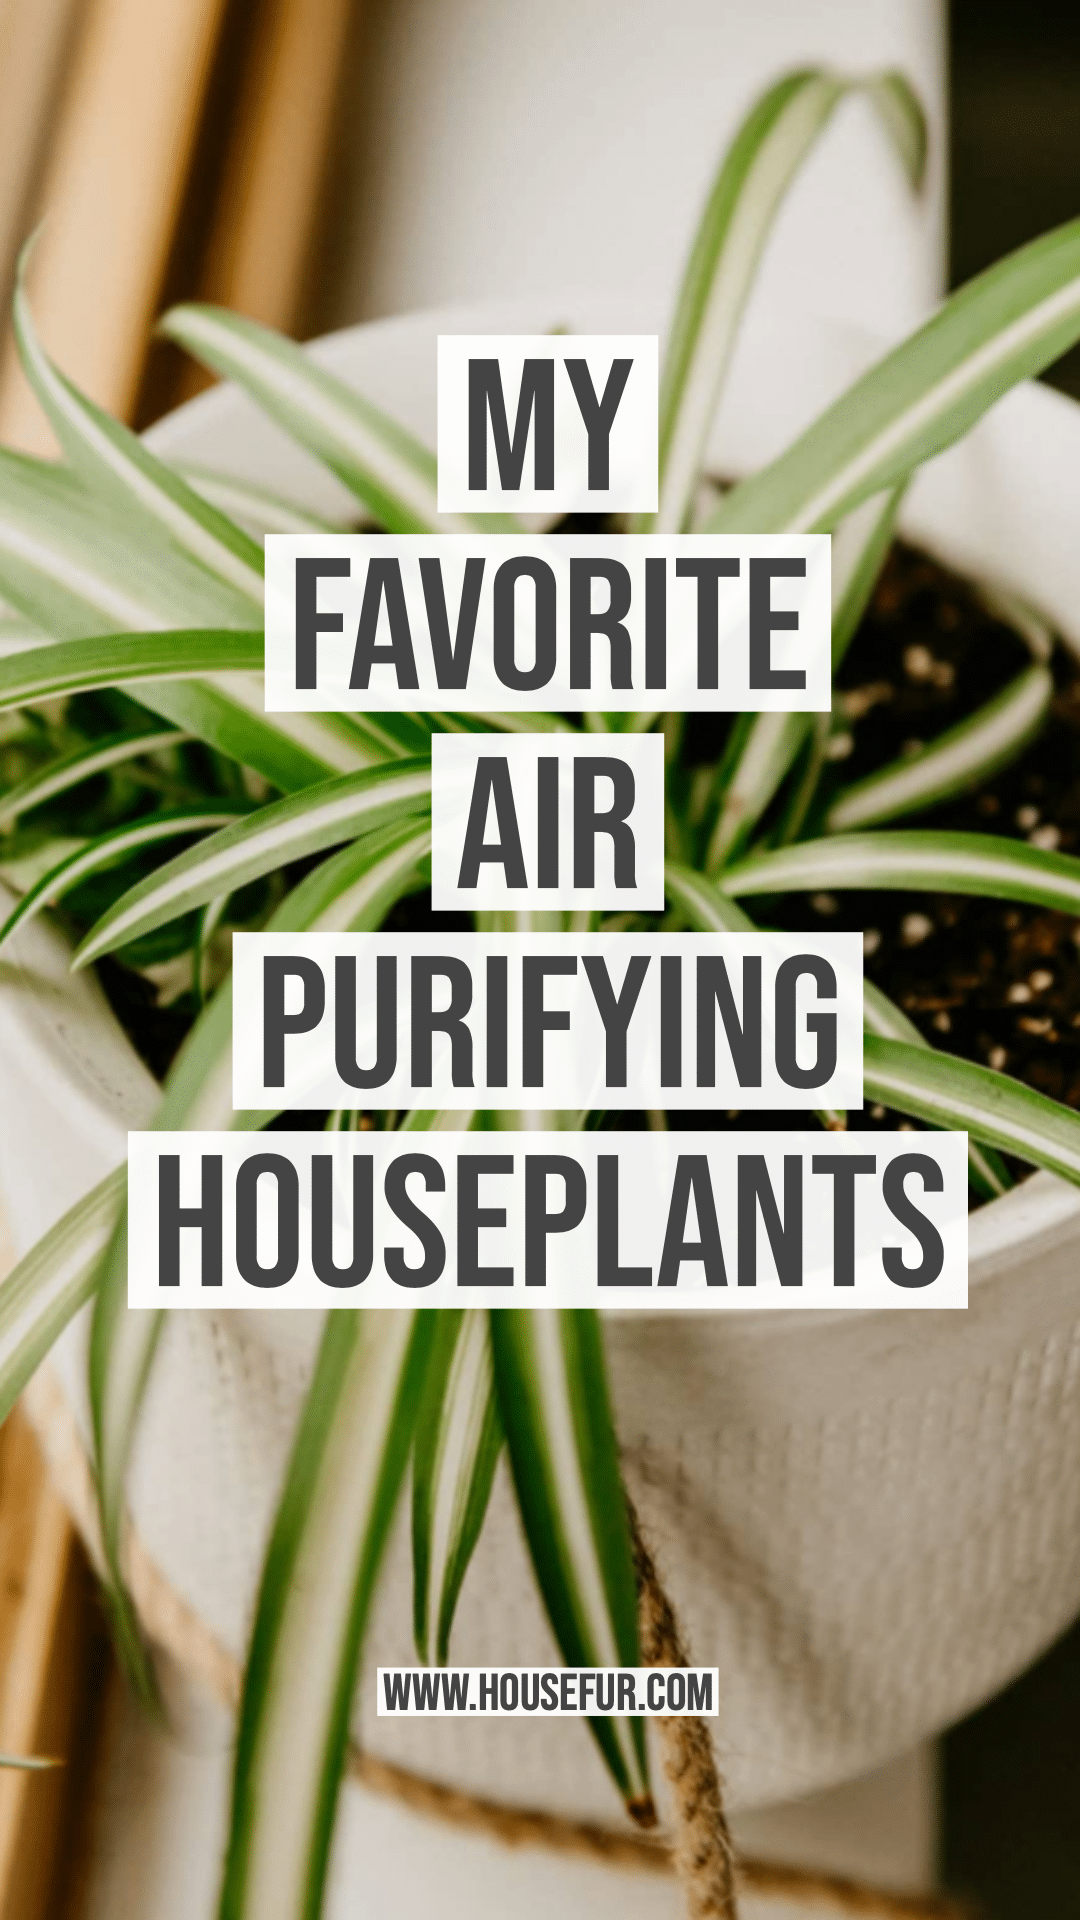 My Favorite Air Purifying Houseplants House Fur Air